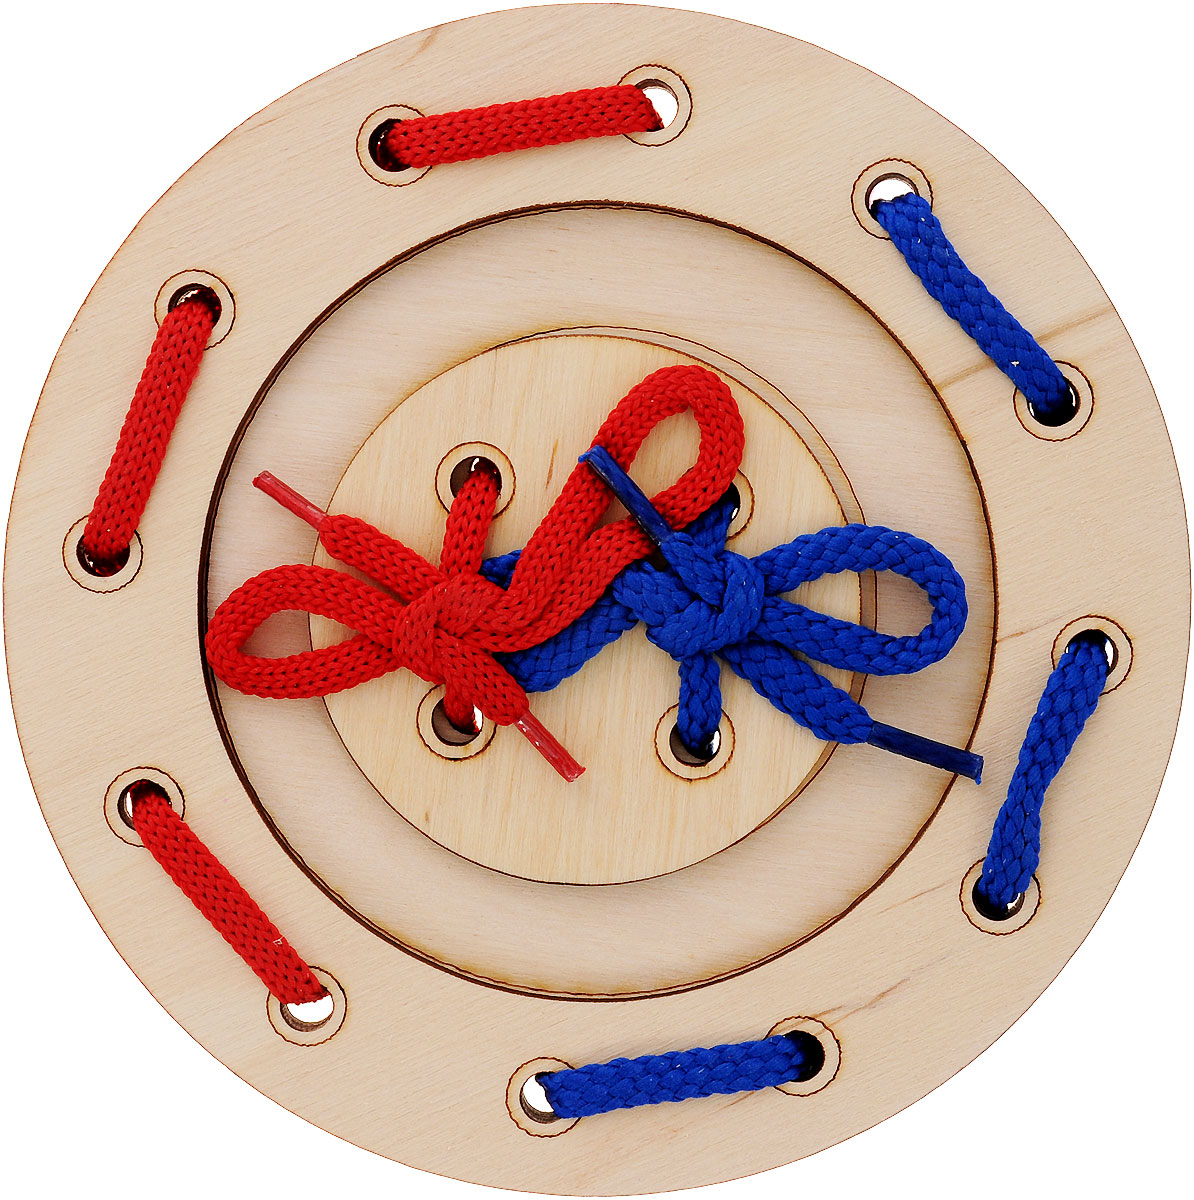 Мастер Вуд Игра-шнуровка Пуговичка цвет синий красный мастер вуд игра шнуровка пуговичка цвет синий желтый